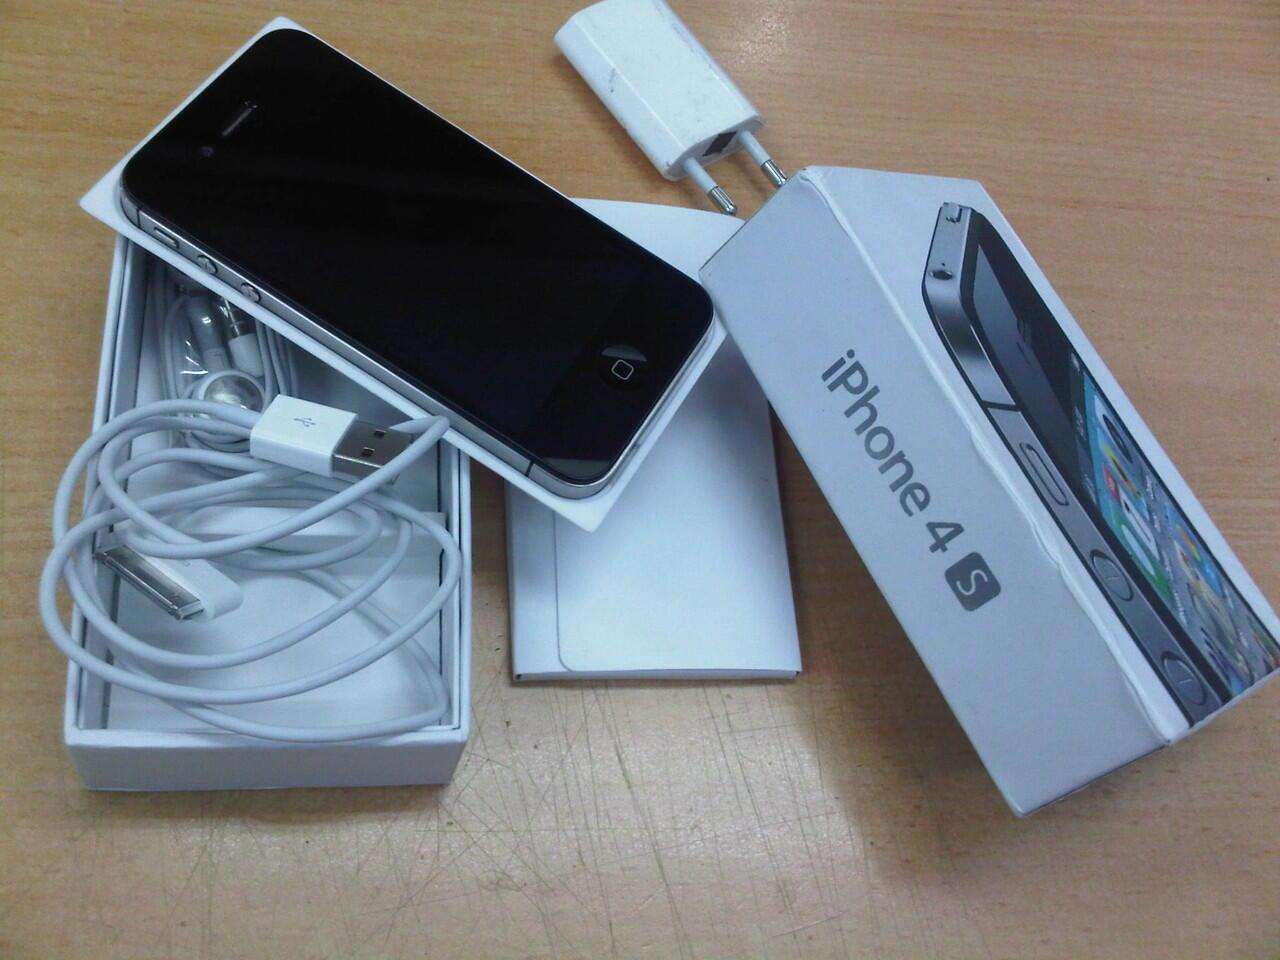 IPHONE 4S 16GB fullset lampu layar mati bekas terjatuh (